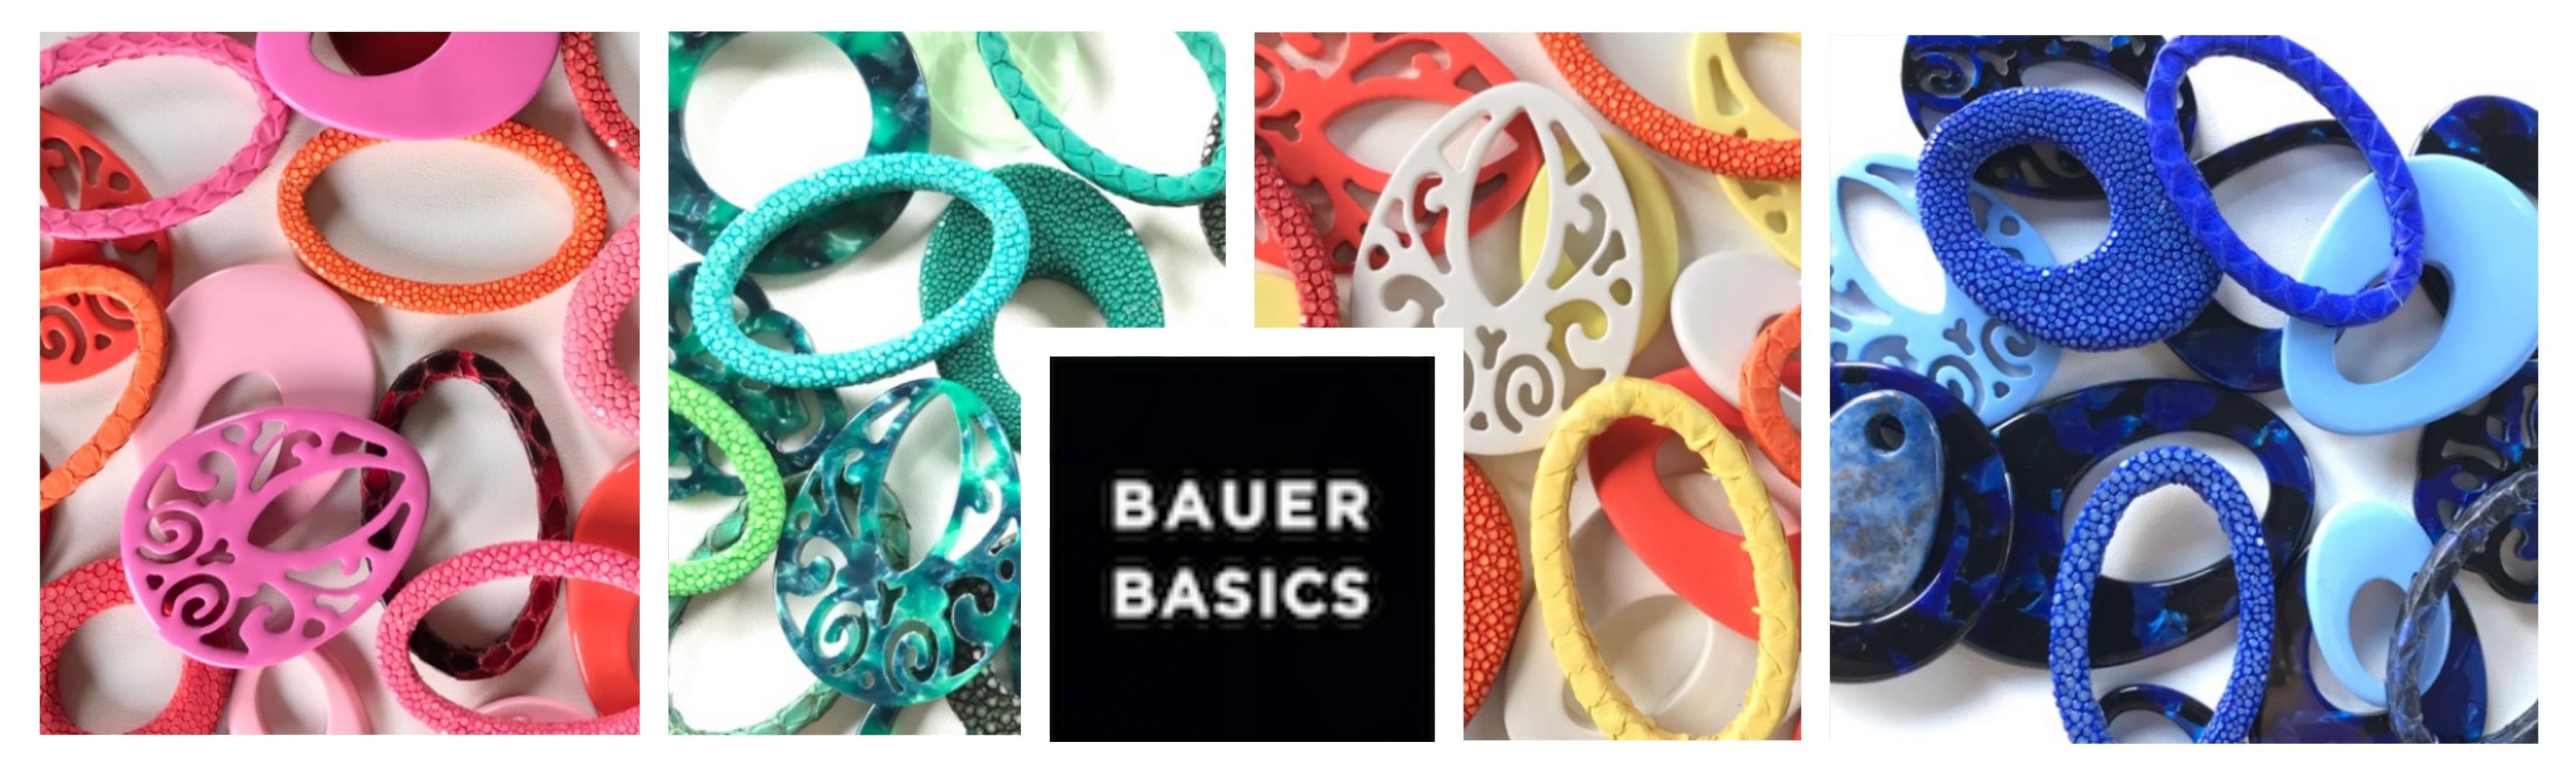 banner Bauer Basics